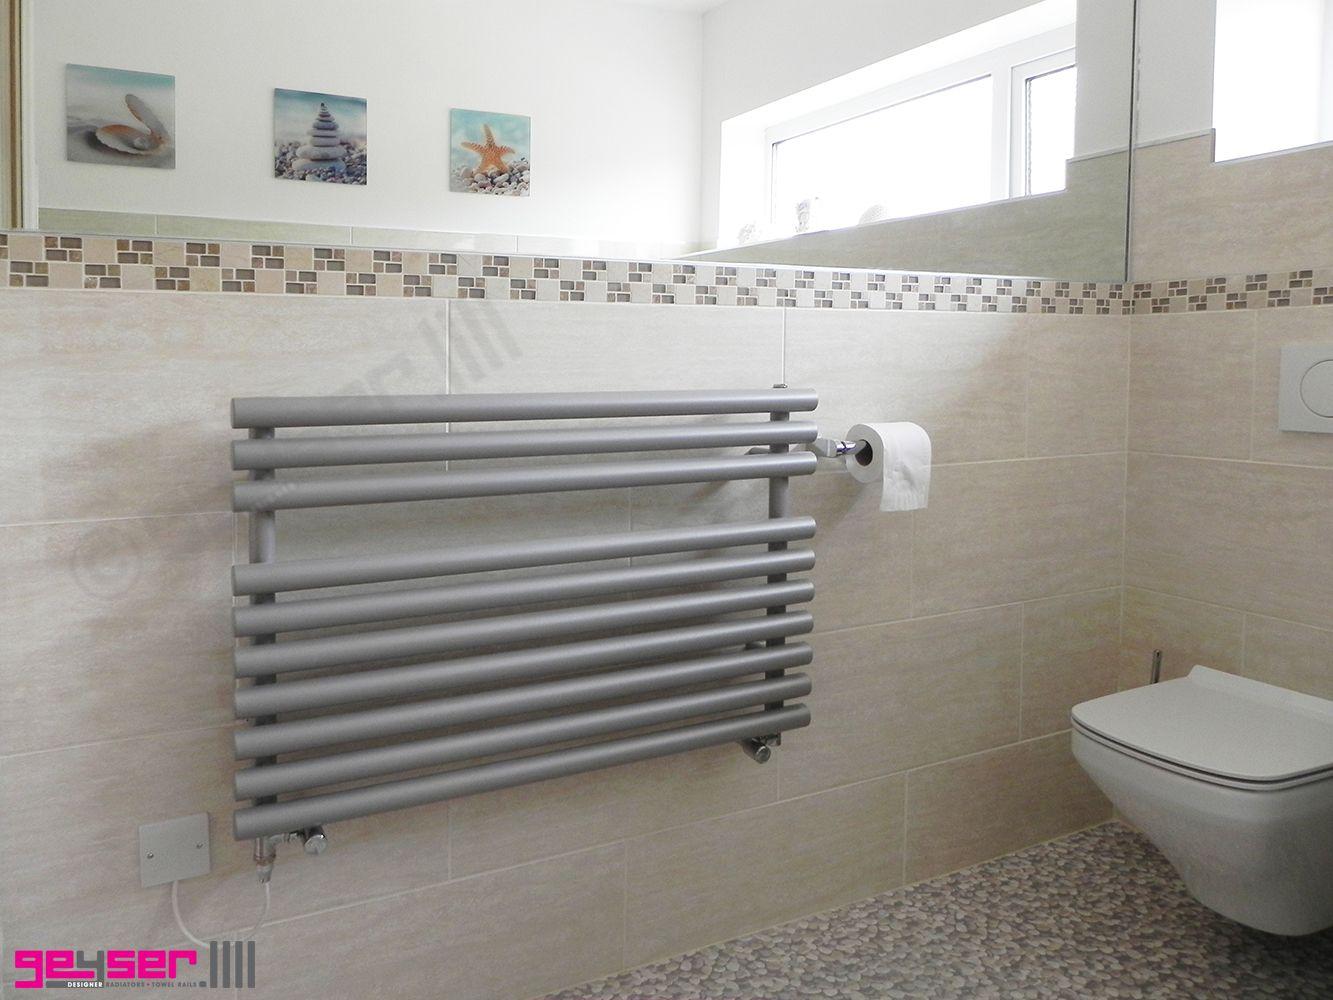 Natasha ladder rail straight modern electric towel radiator in chrome - Geyser Cirtowelo Grigio Pale Grey Heated Towel Rail Electric Towel Rail